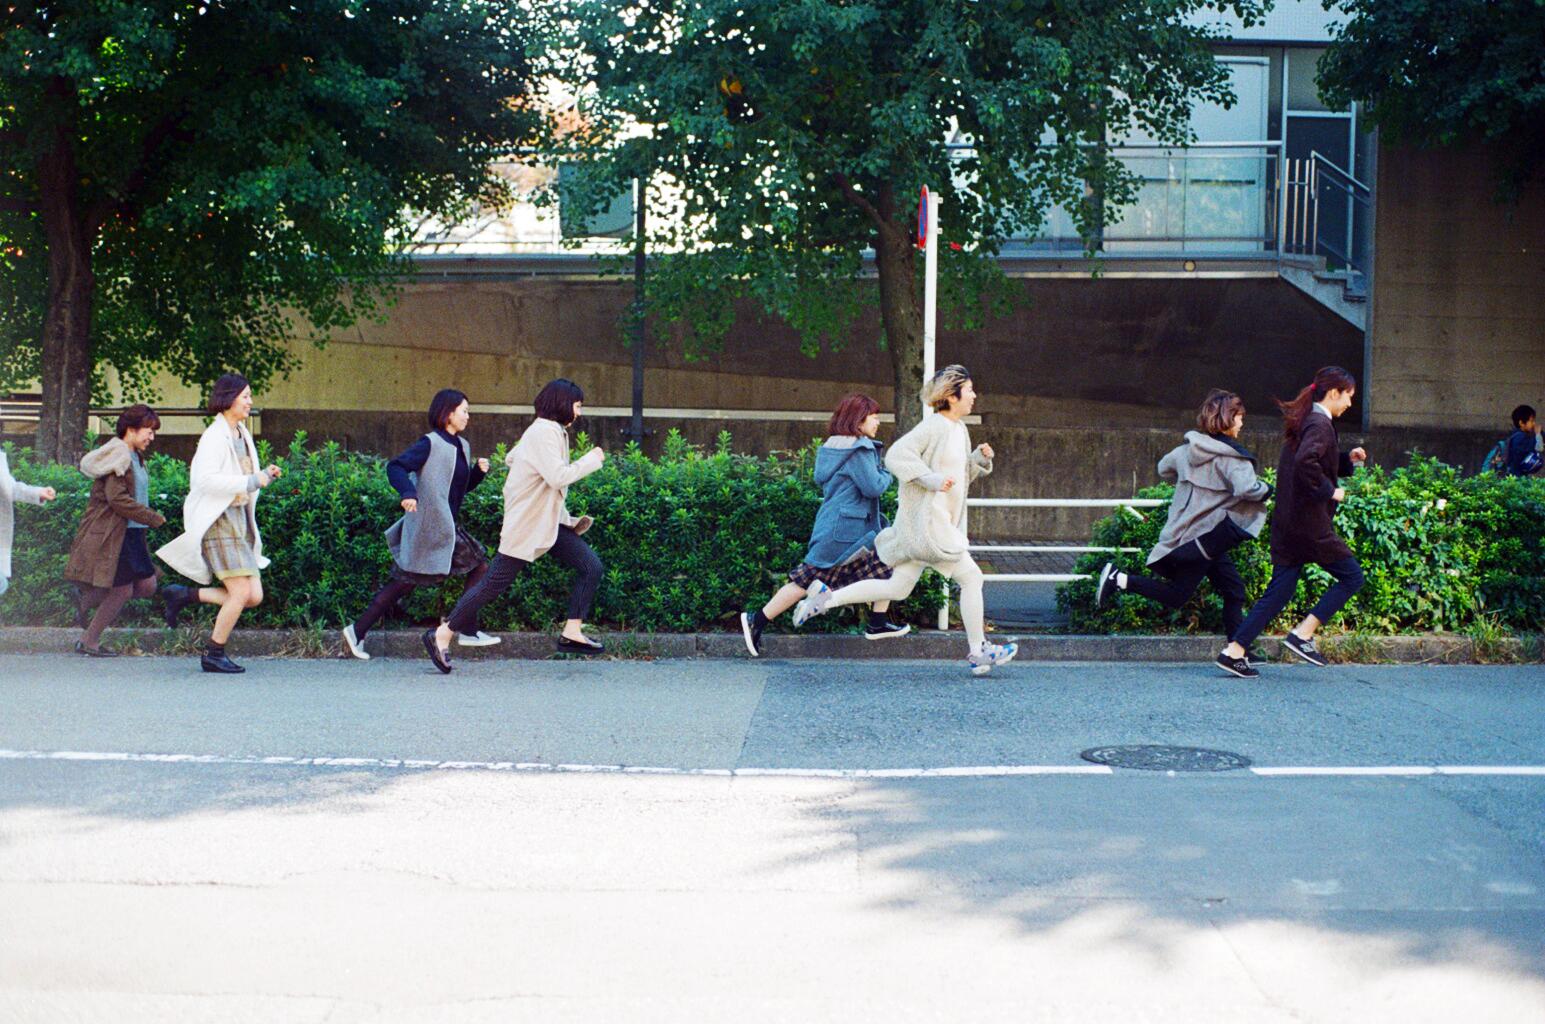 Women running on a coat_2.jpg